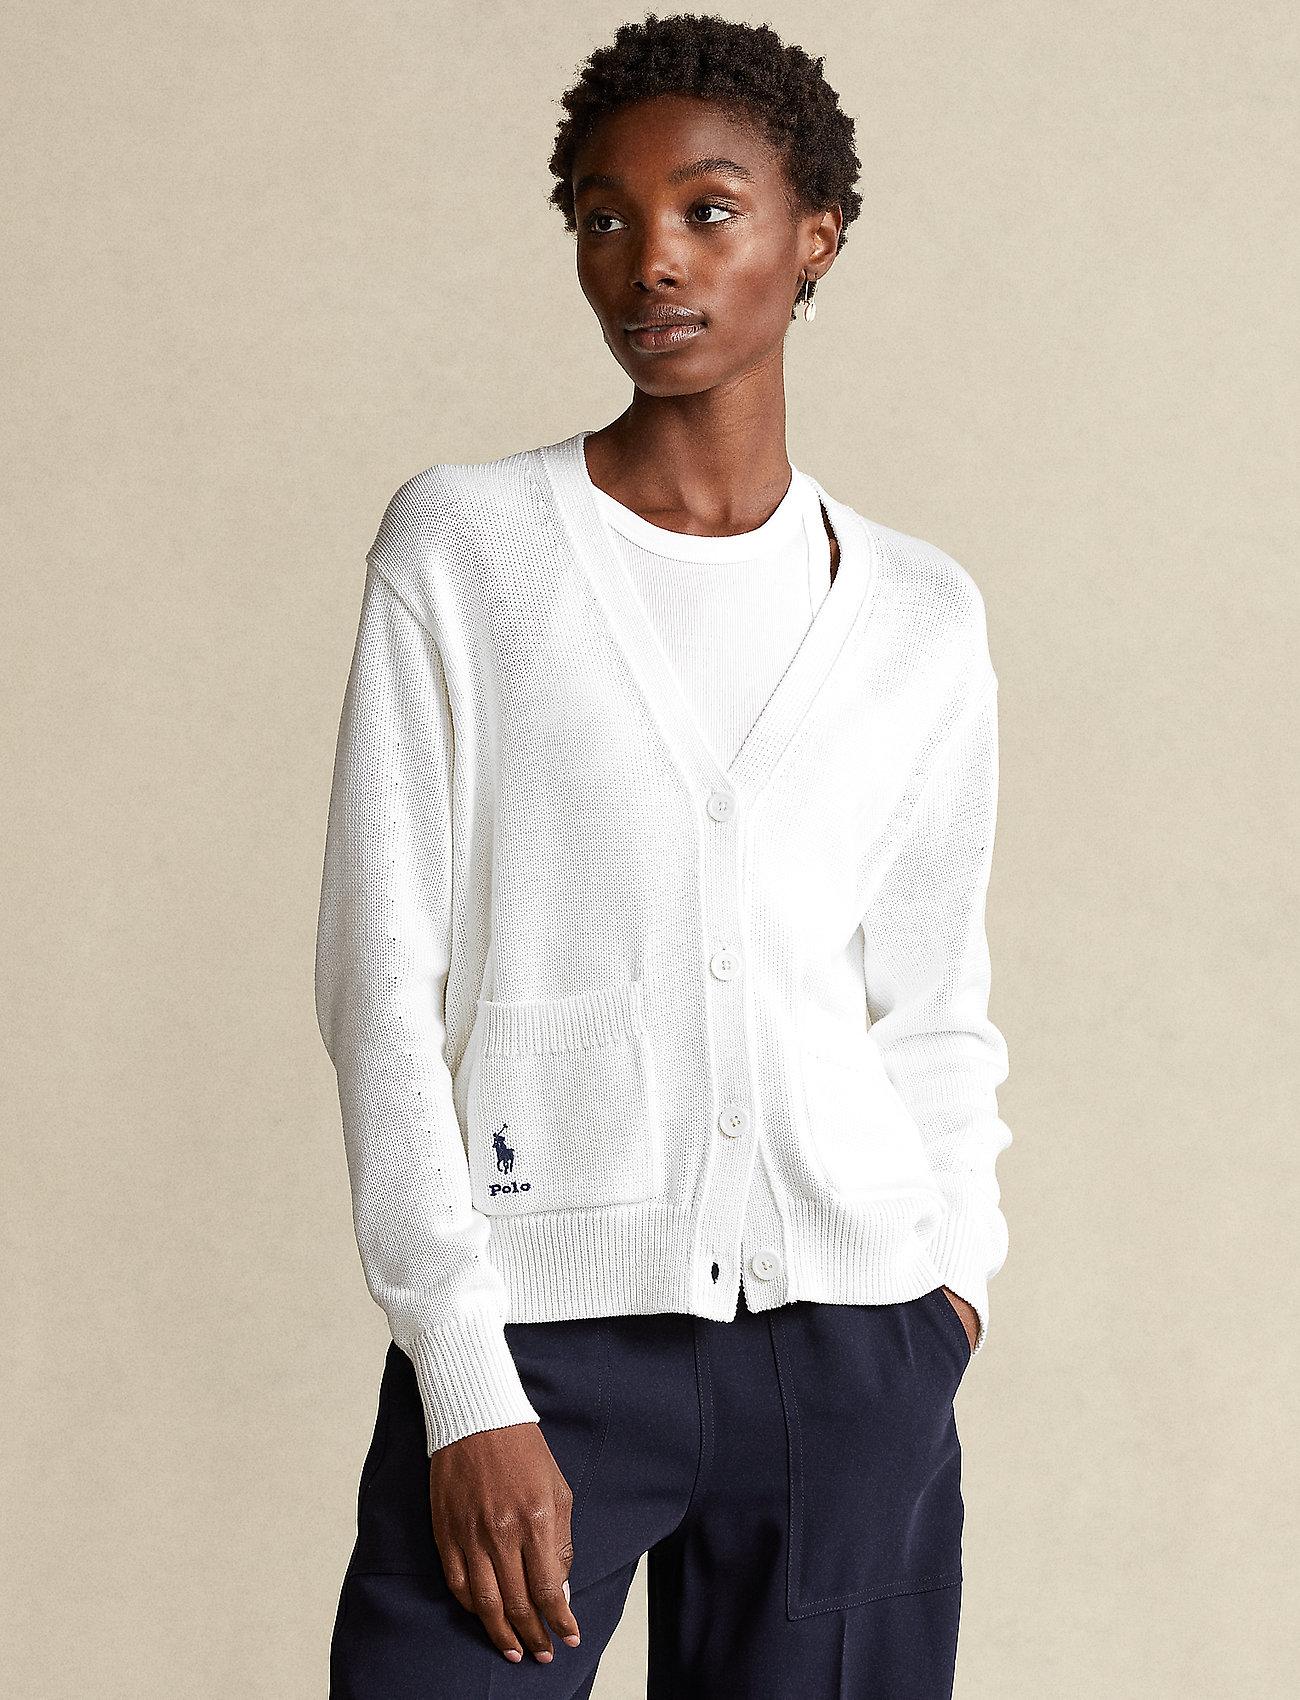 Polo Ralph Lauren - COTTON JERSEY-LSL-SWT - cardigans - white - 0